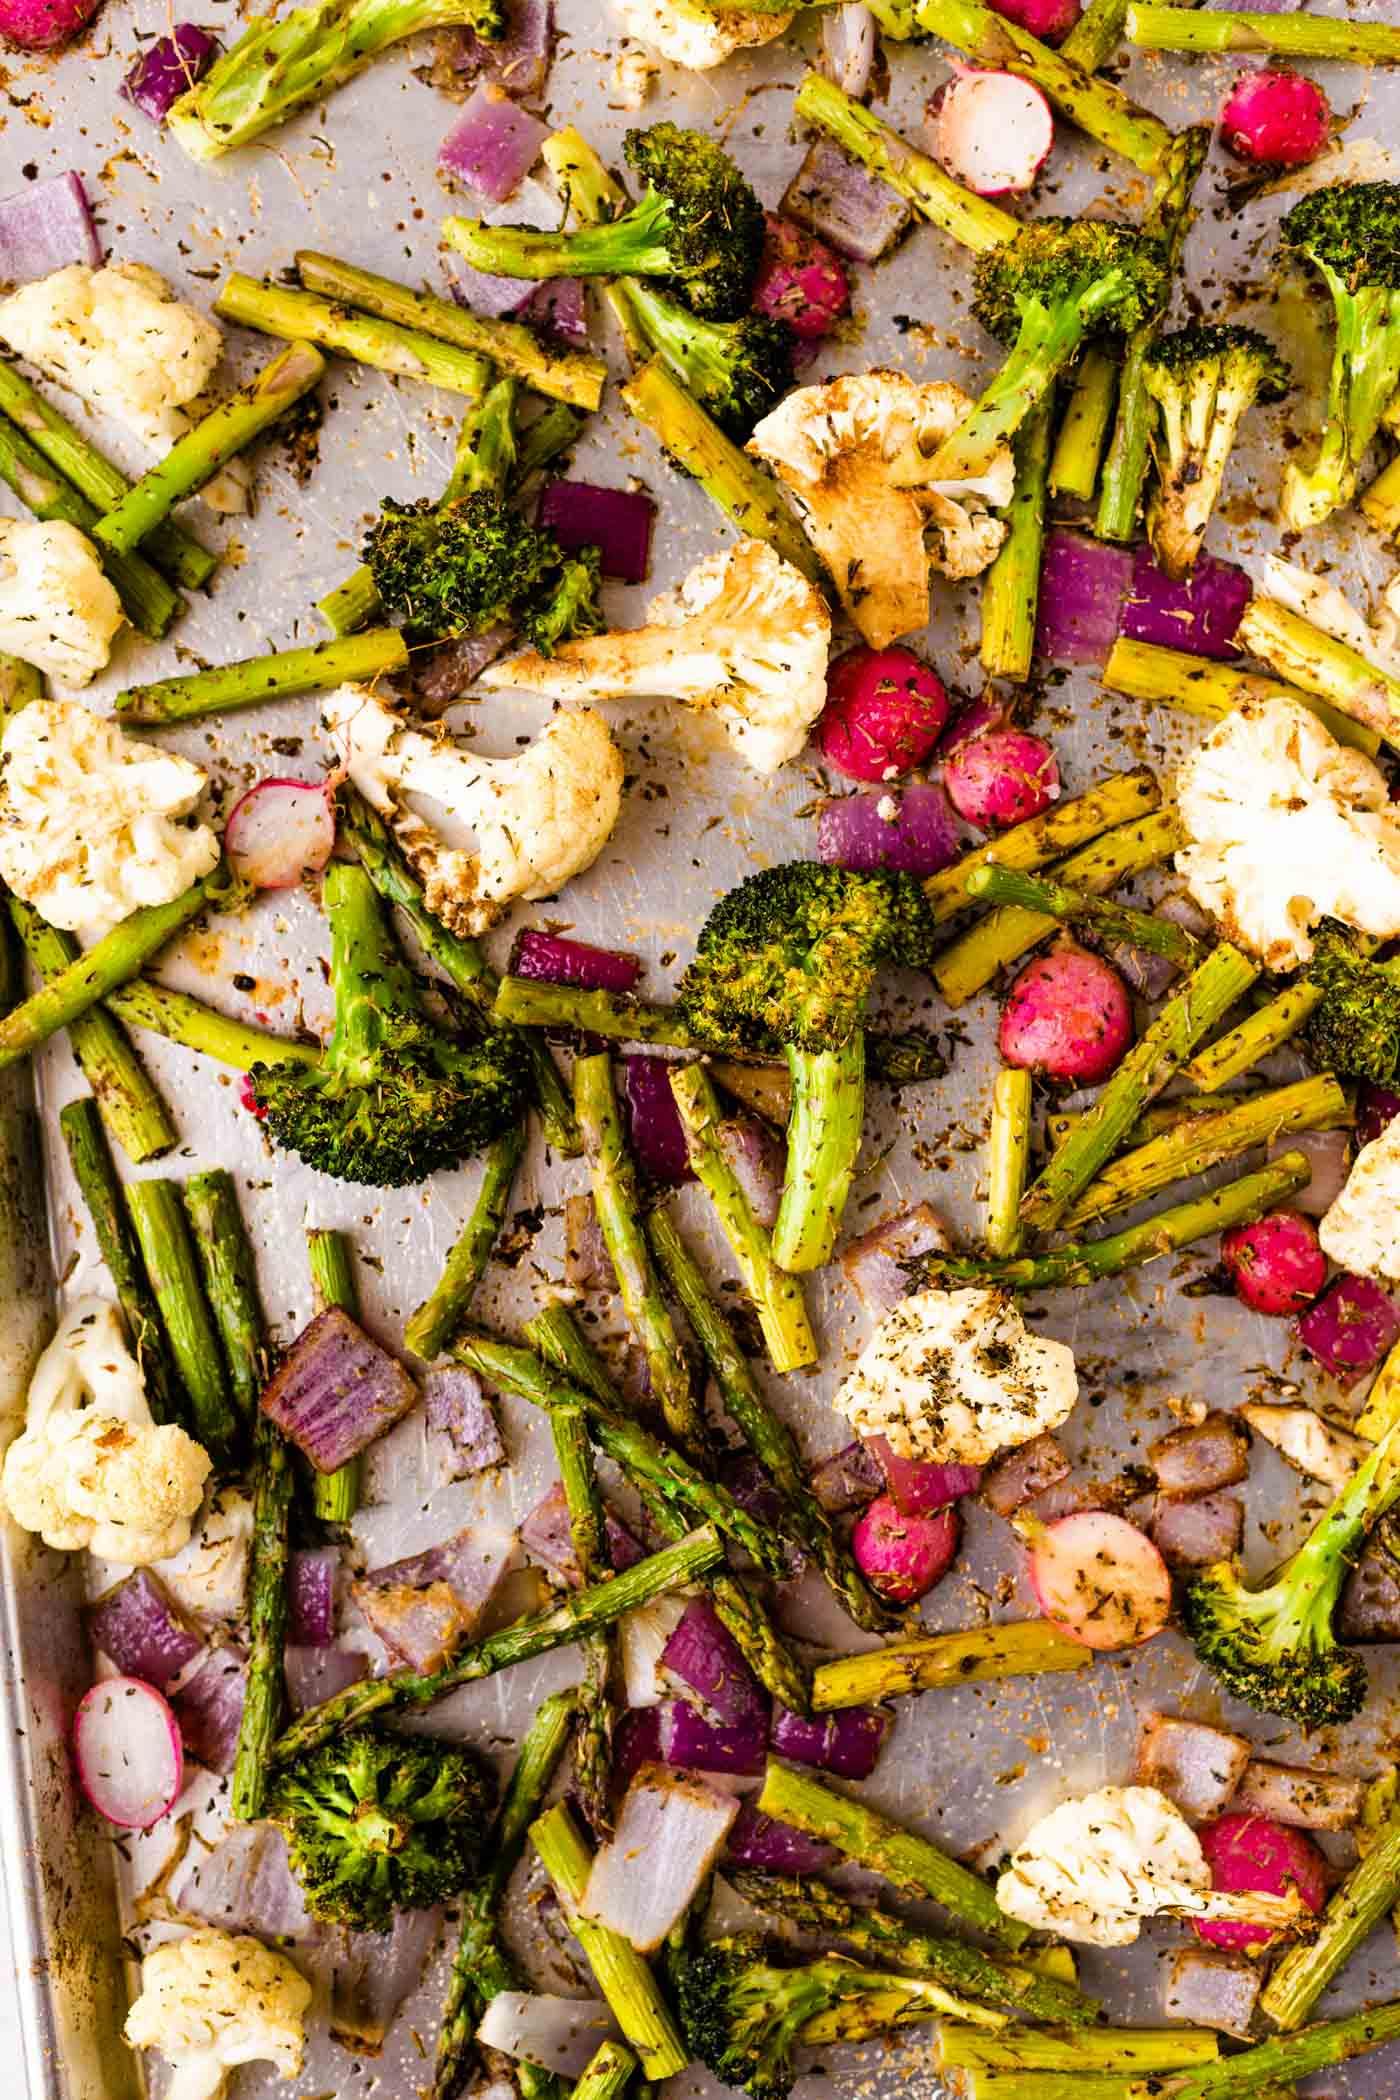 Roasted broccoli, asparagus, cauliflower, radishes and red onion on baking sheet